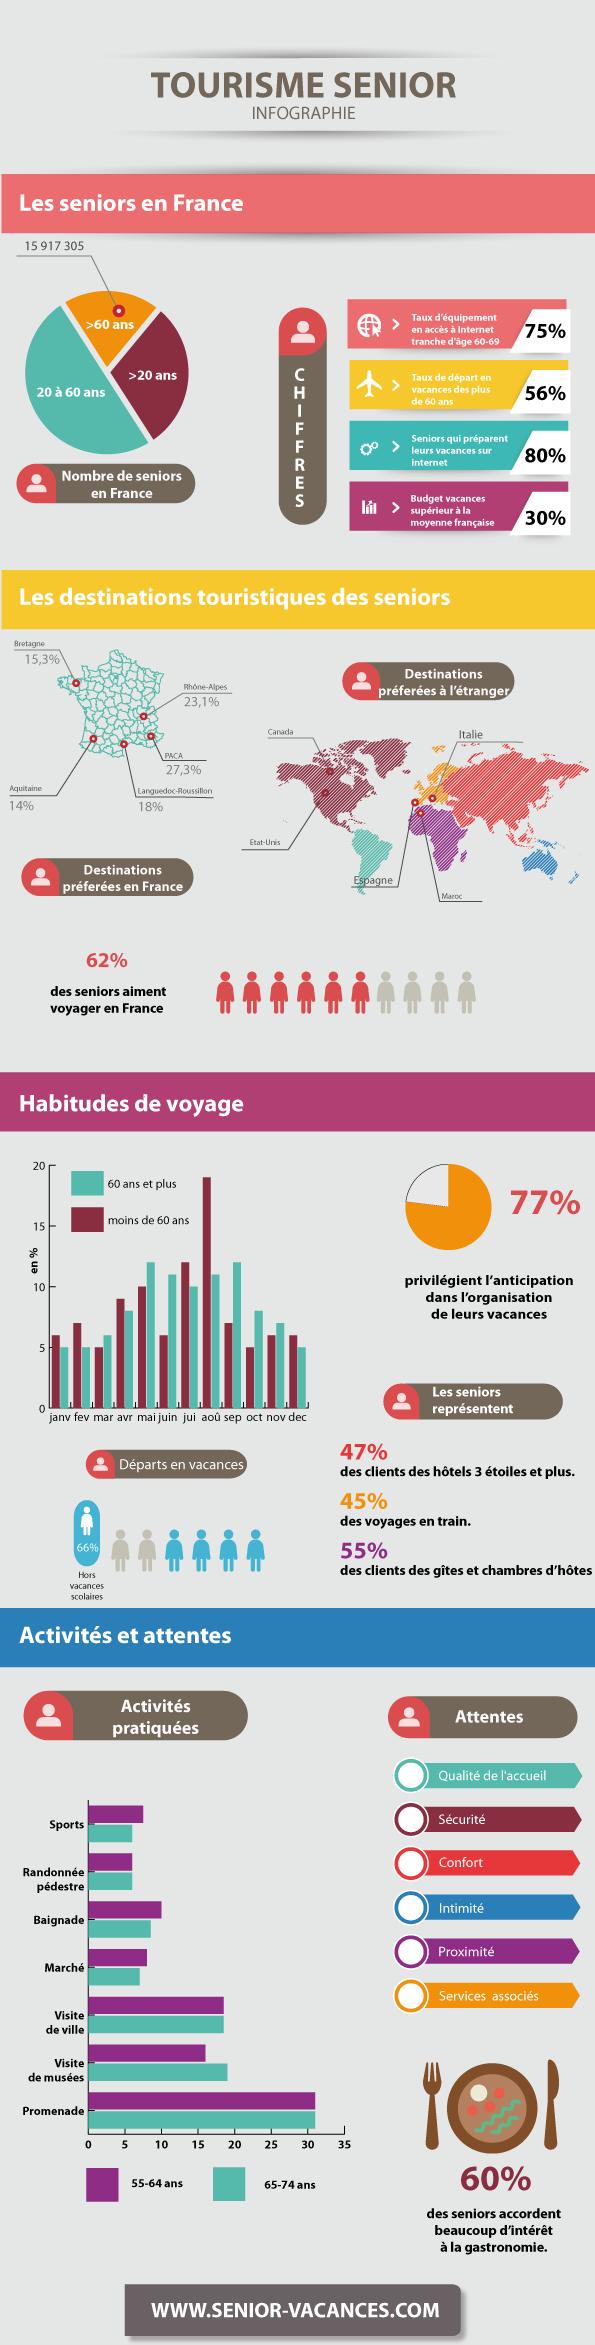 infographie-tourisme-senior-1